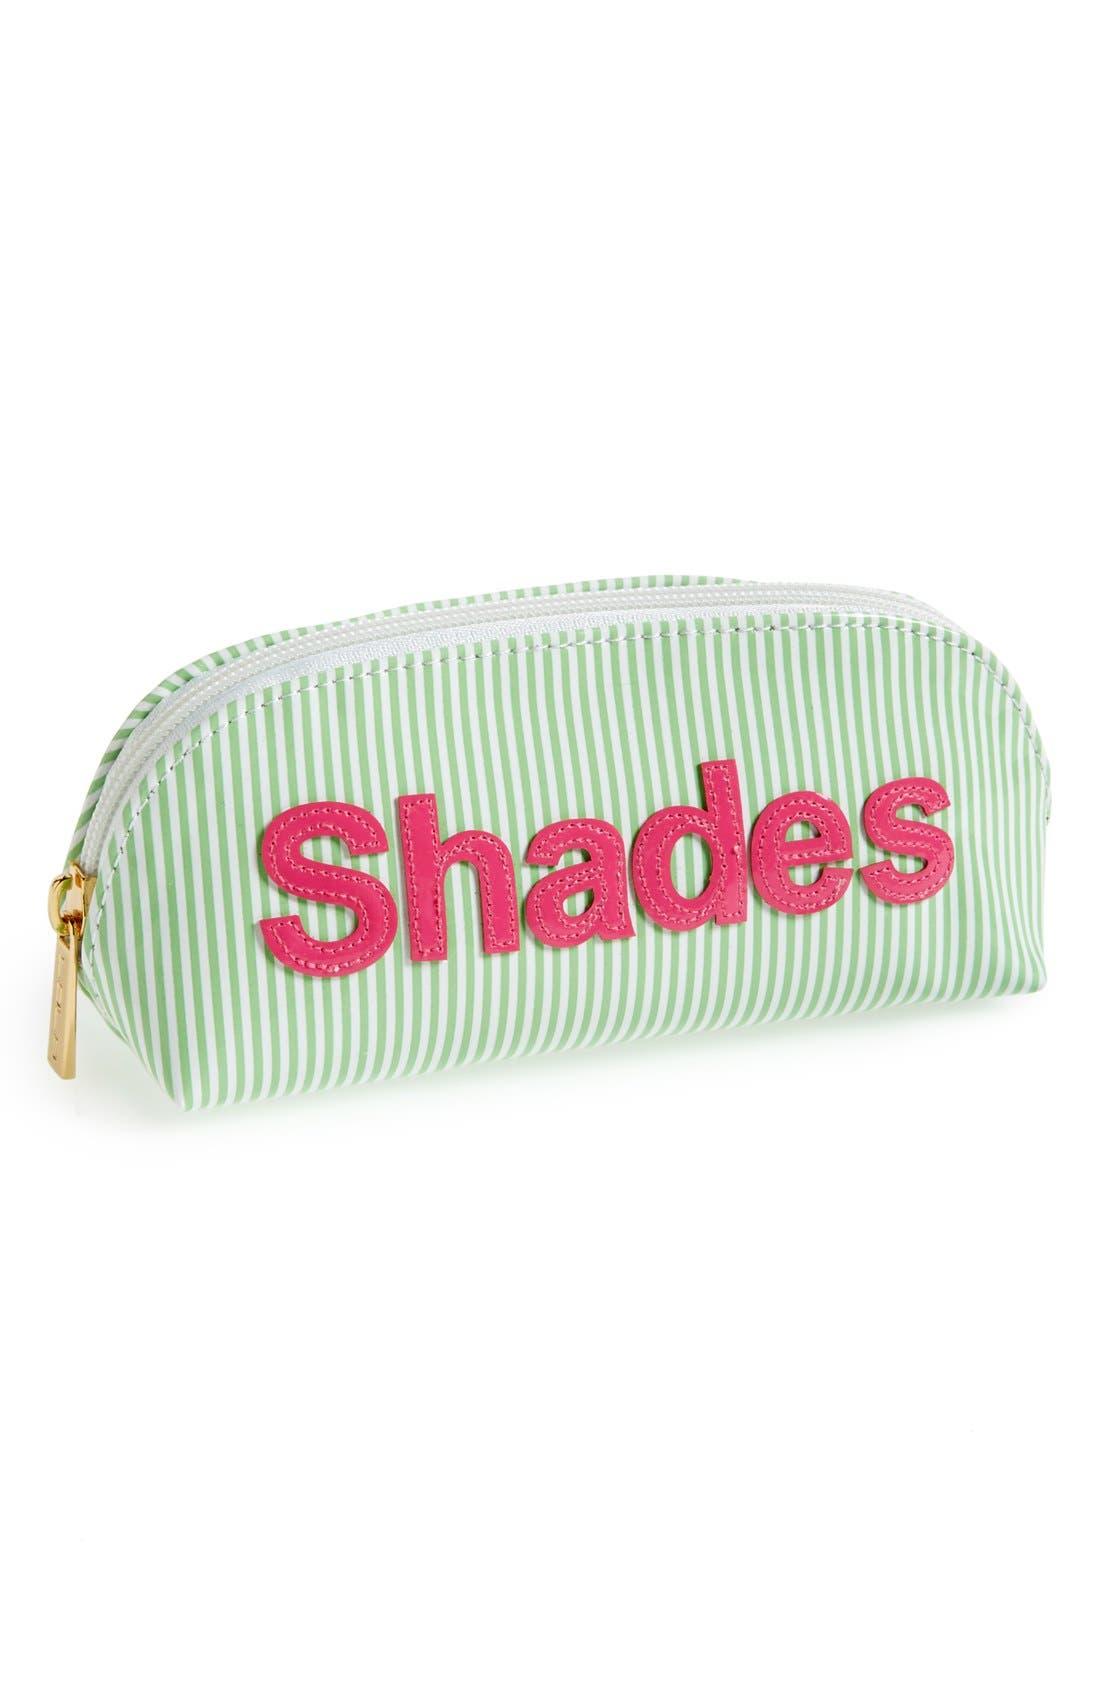 Main Image - Lolo Sunglasses Pouch